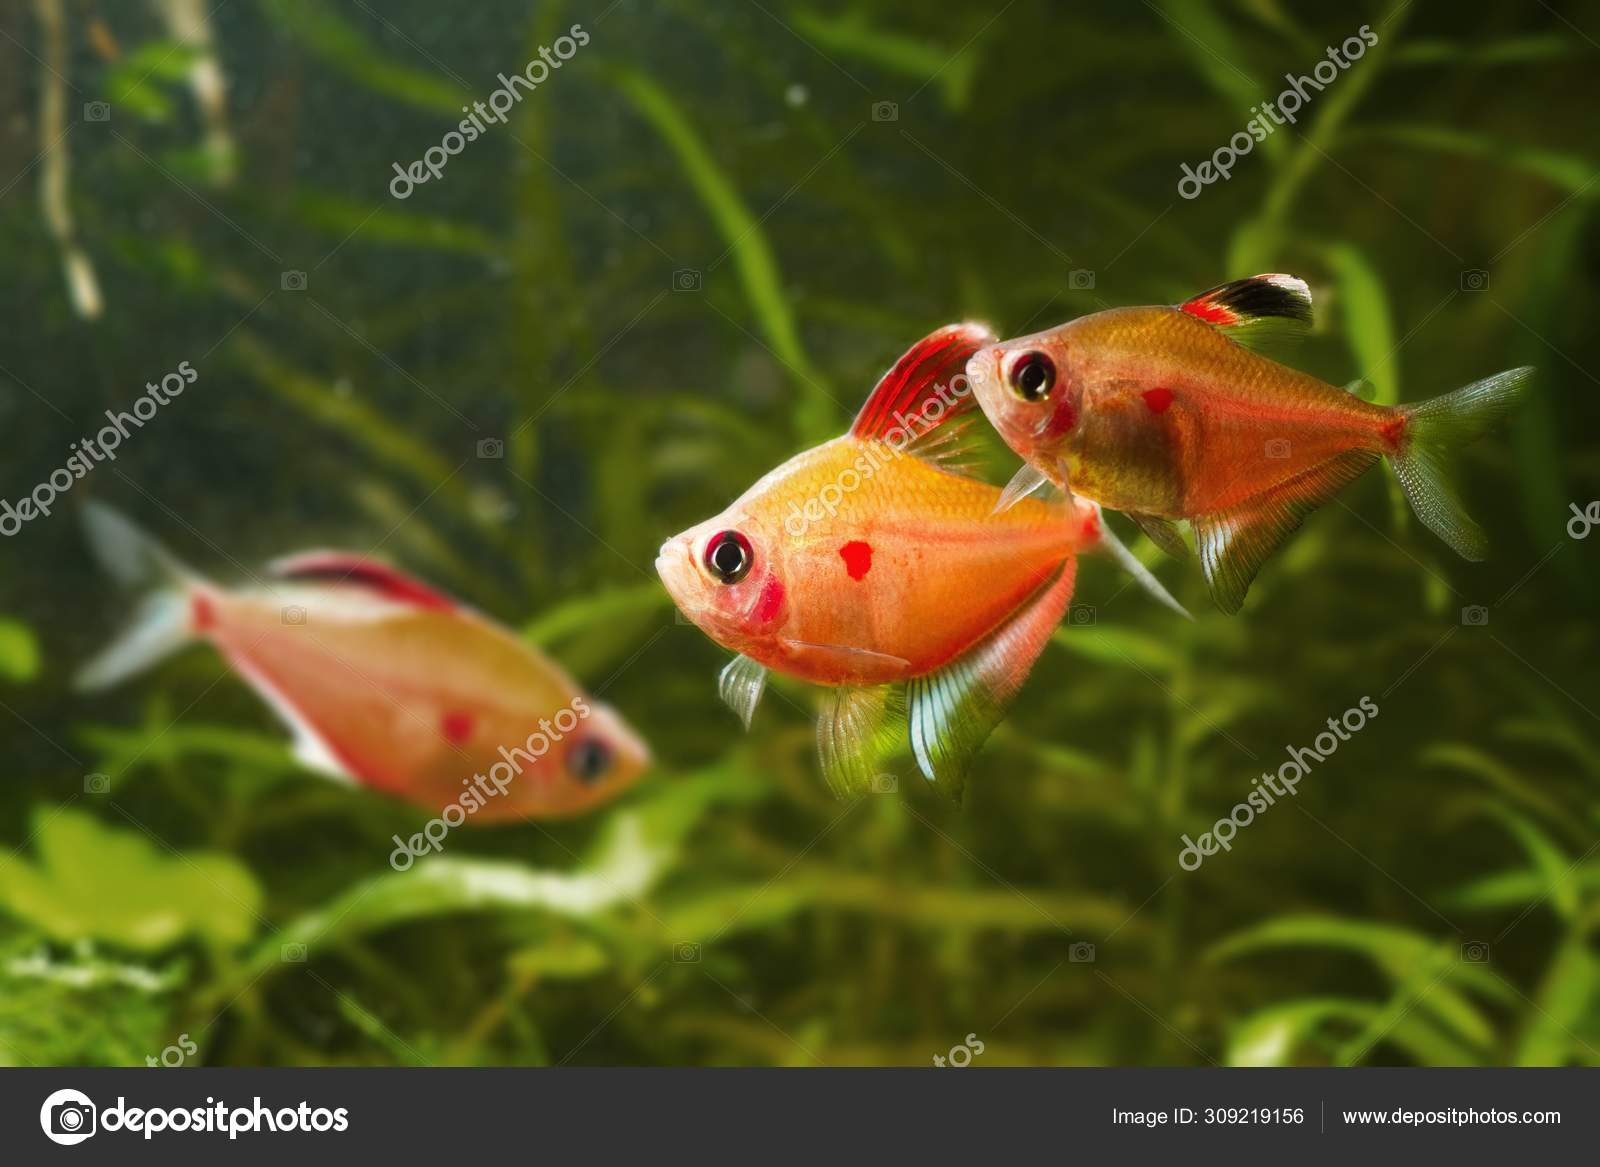 Bleeding Heart Tetra Hyphessobrycon Socolofi Popular Ornamental Blackwater Wild Fish Stock Photo C Valeronio 309219156